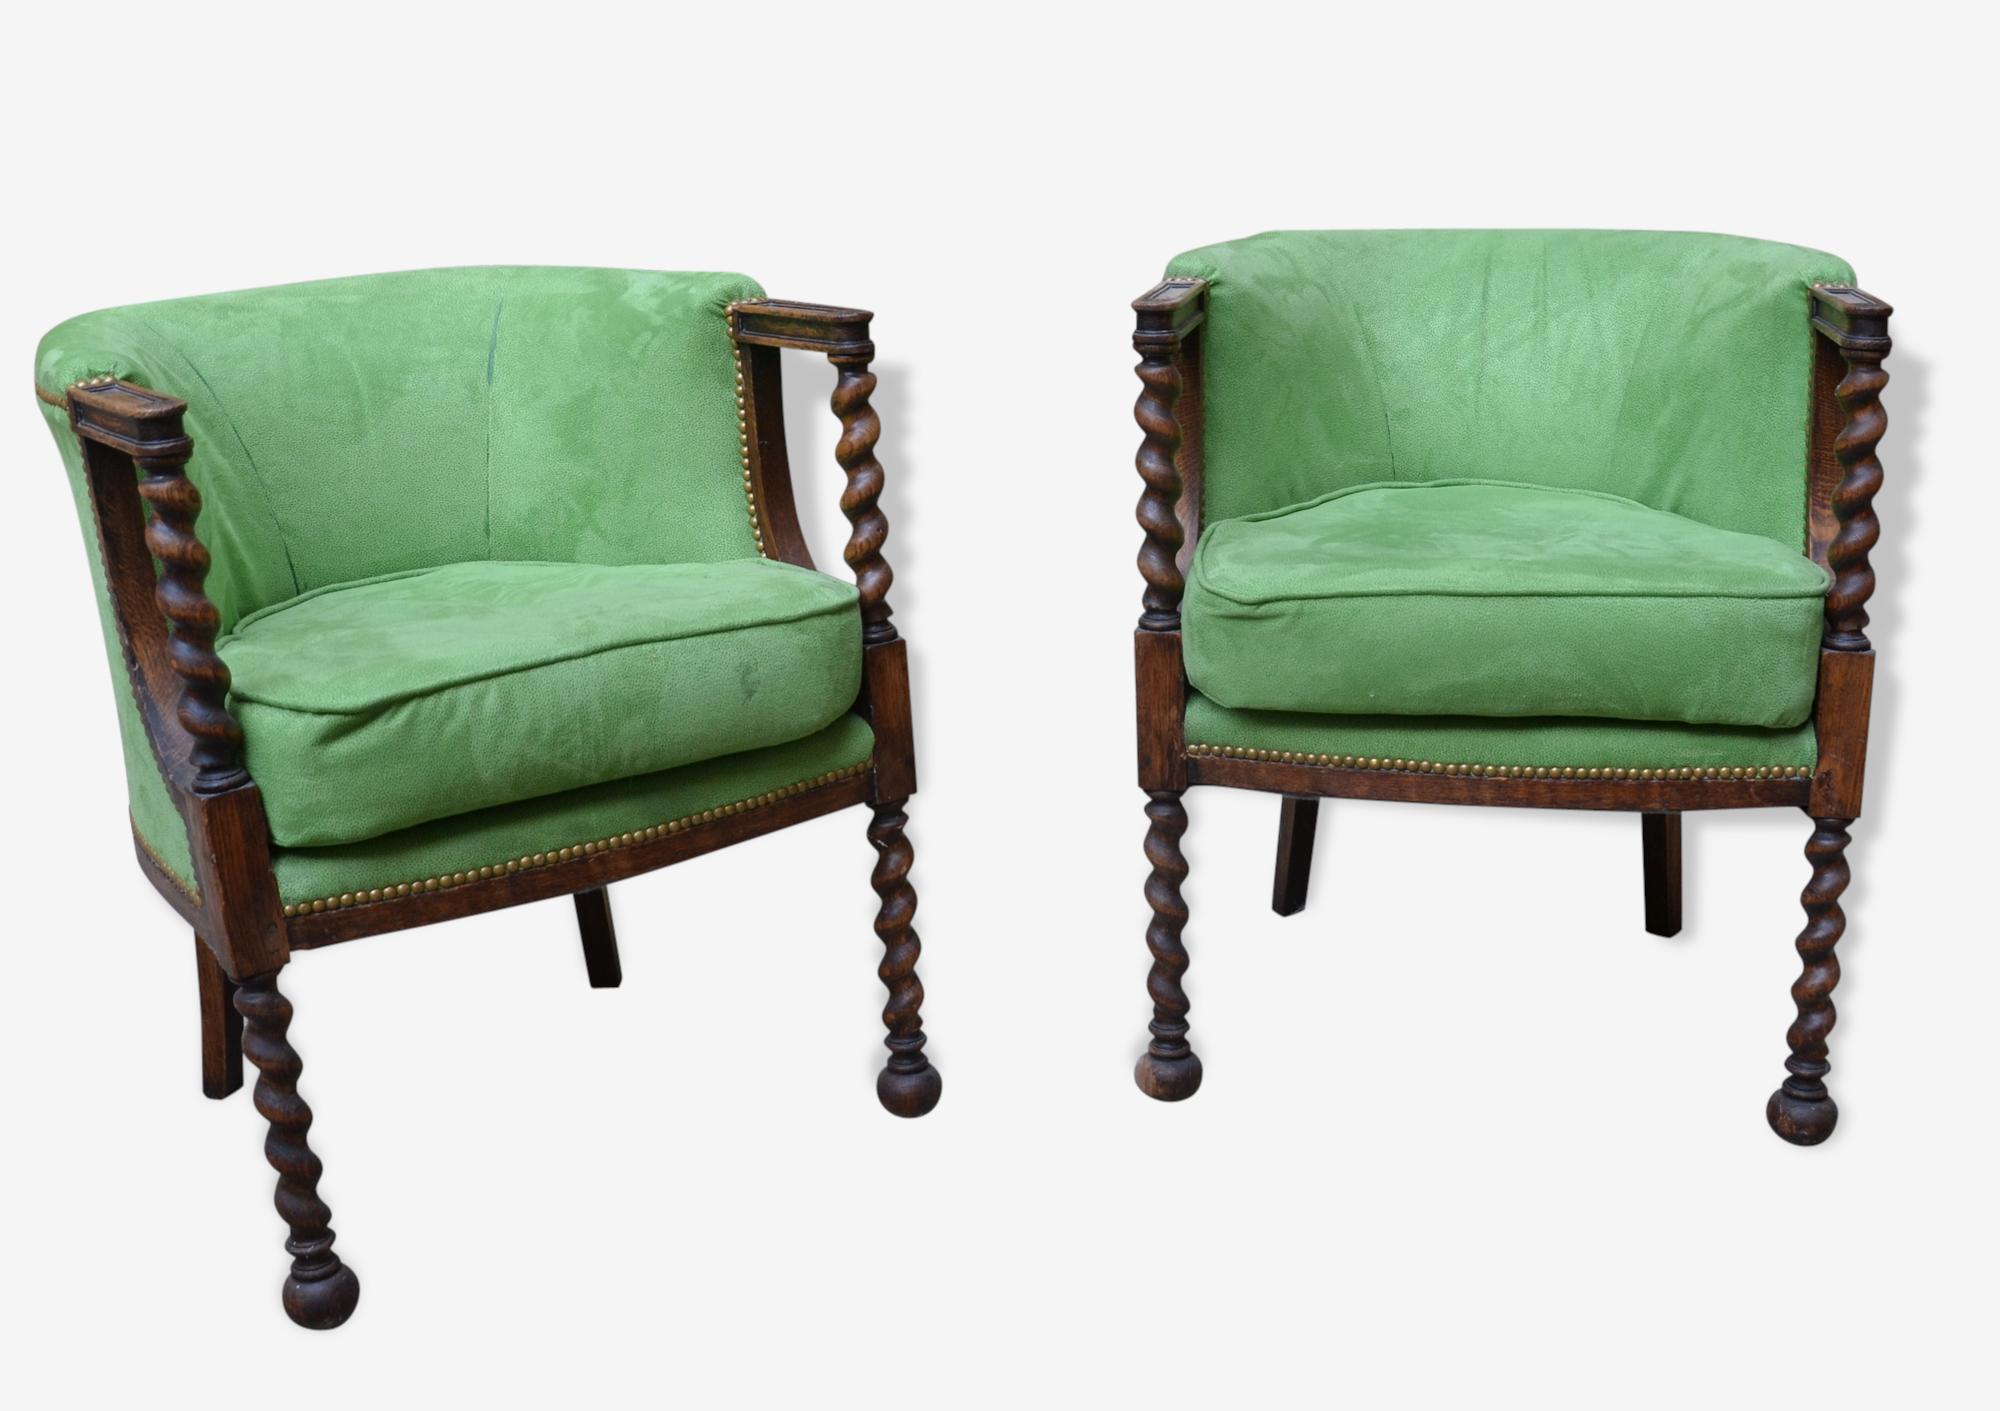 Paire de fauteuils rococo